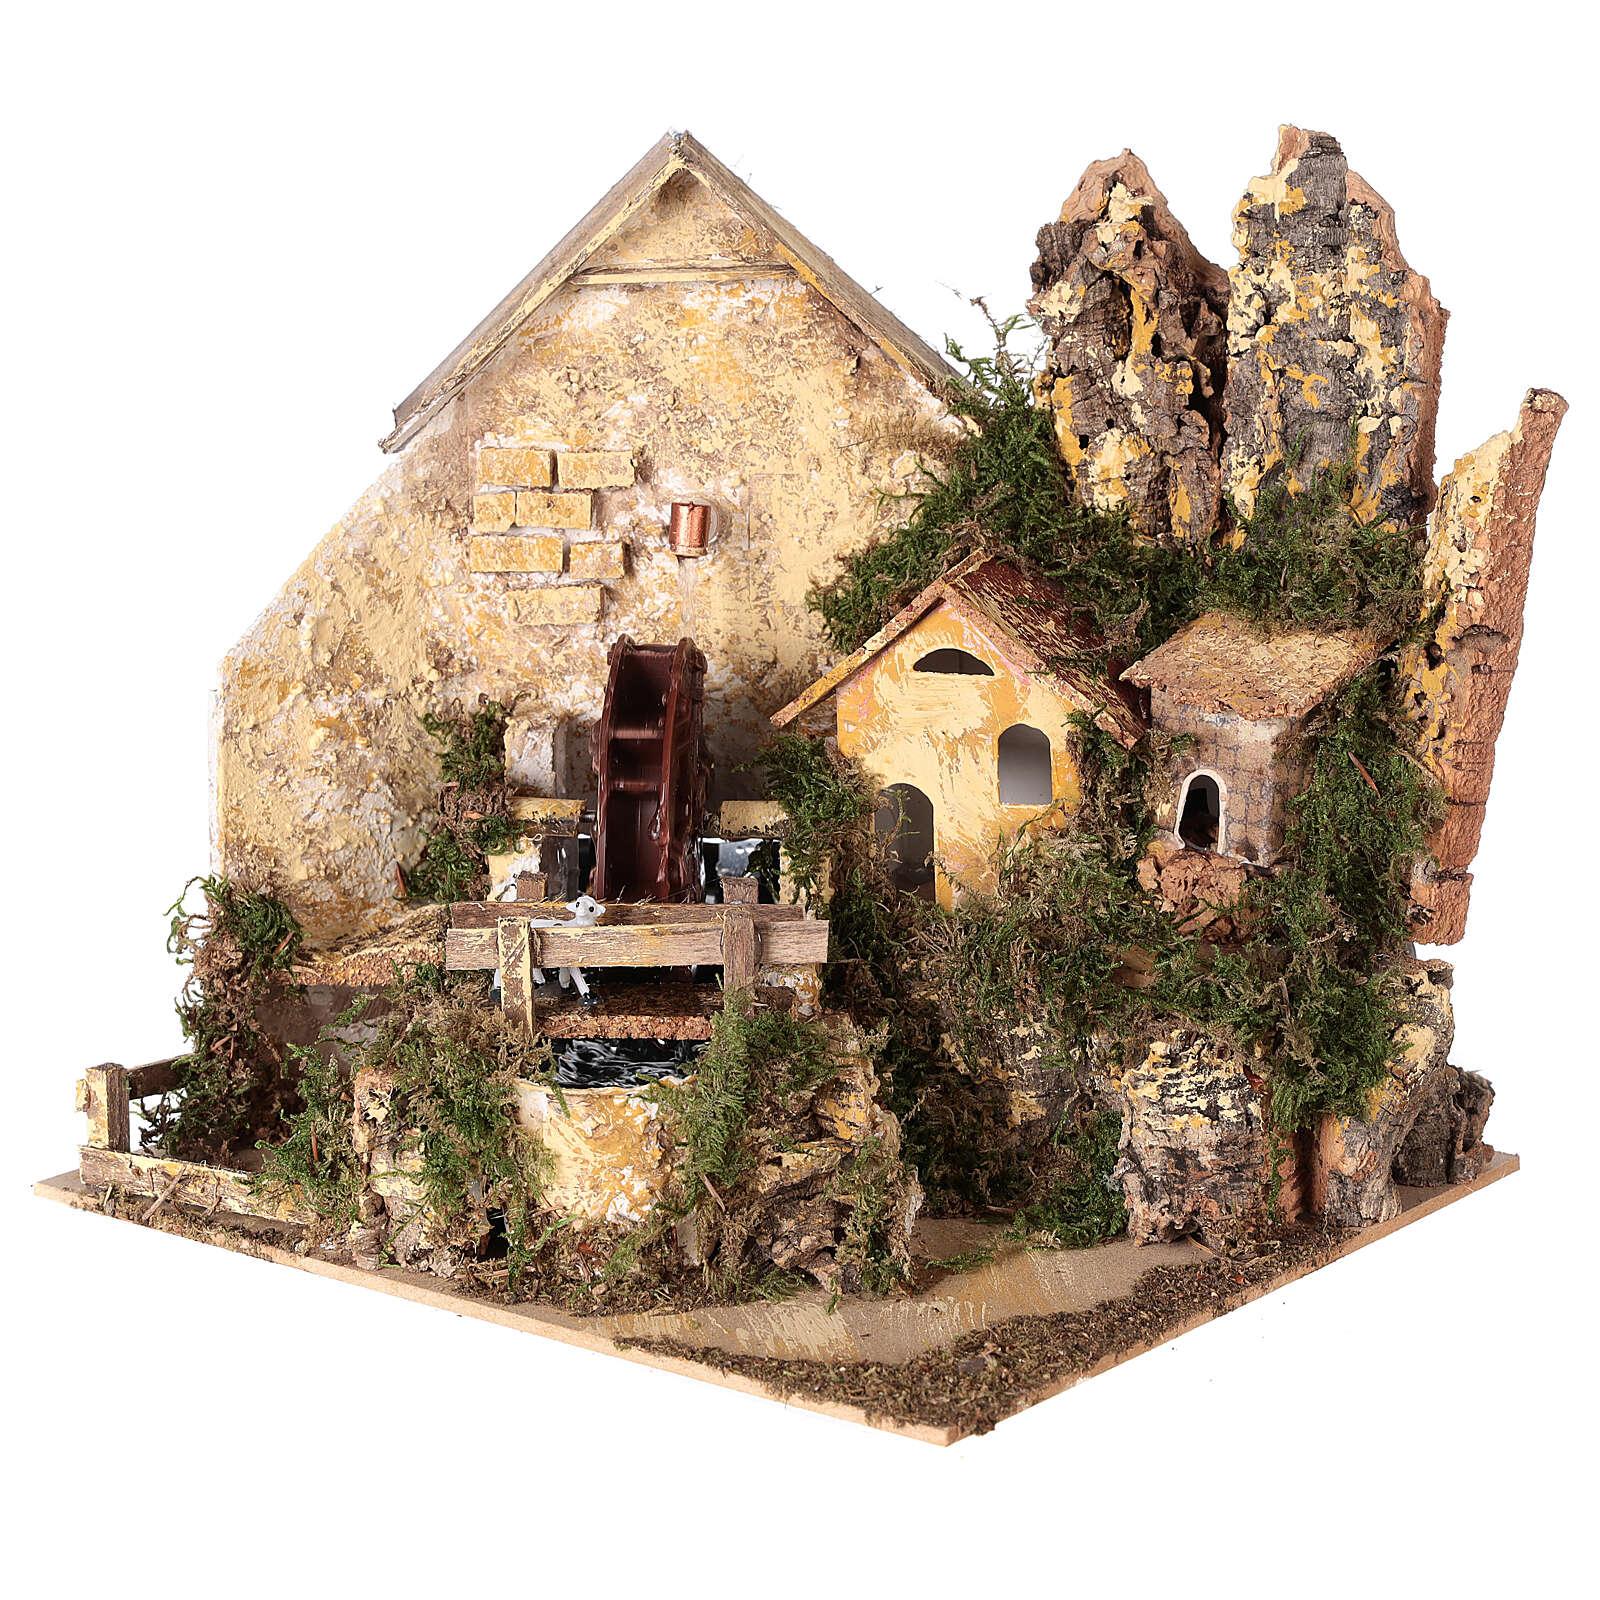 Watermill sheep nativity village 25x25x20 cm for 6 cm figures 4